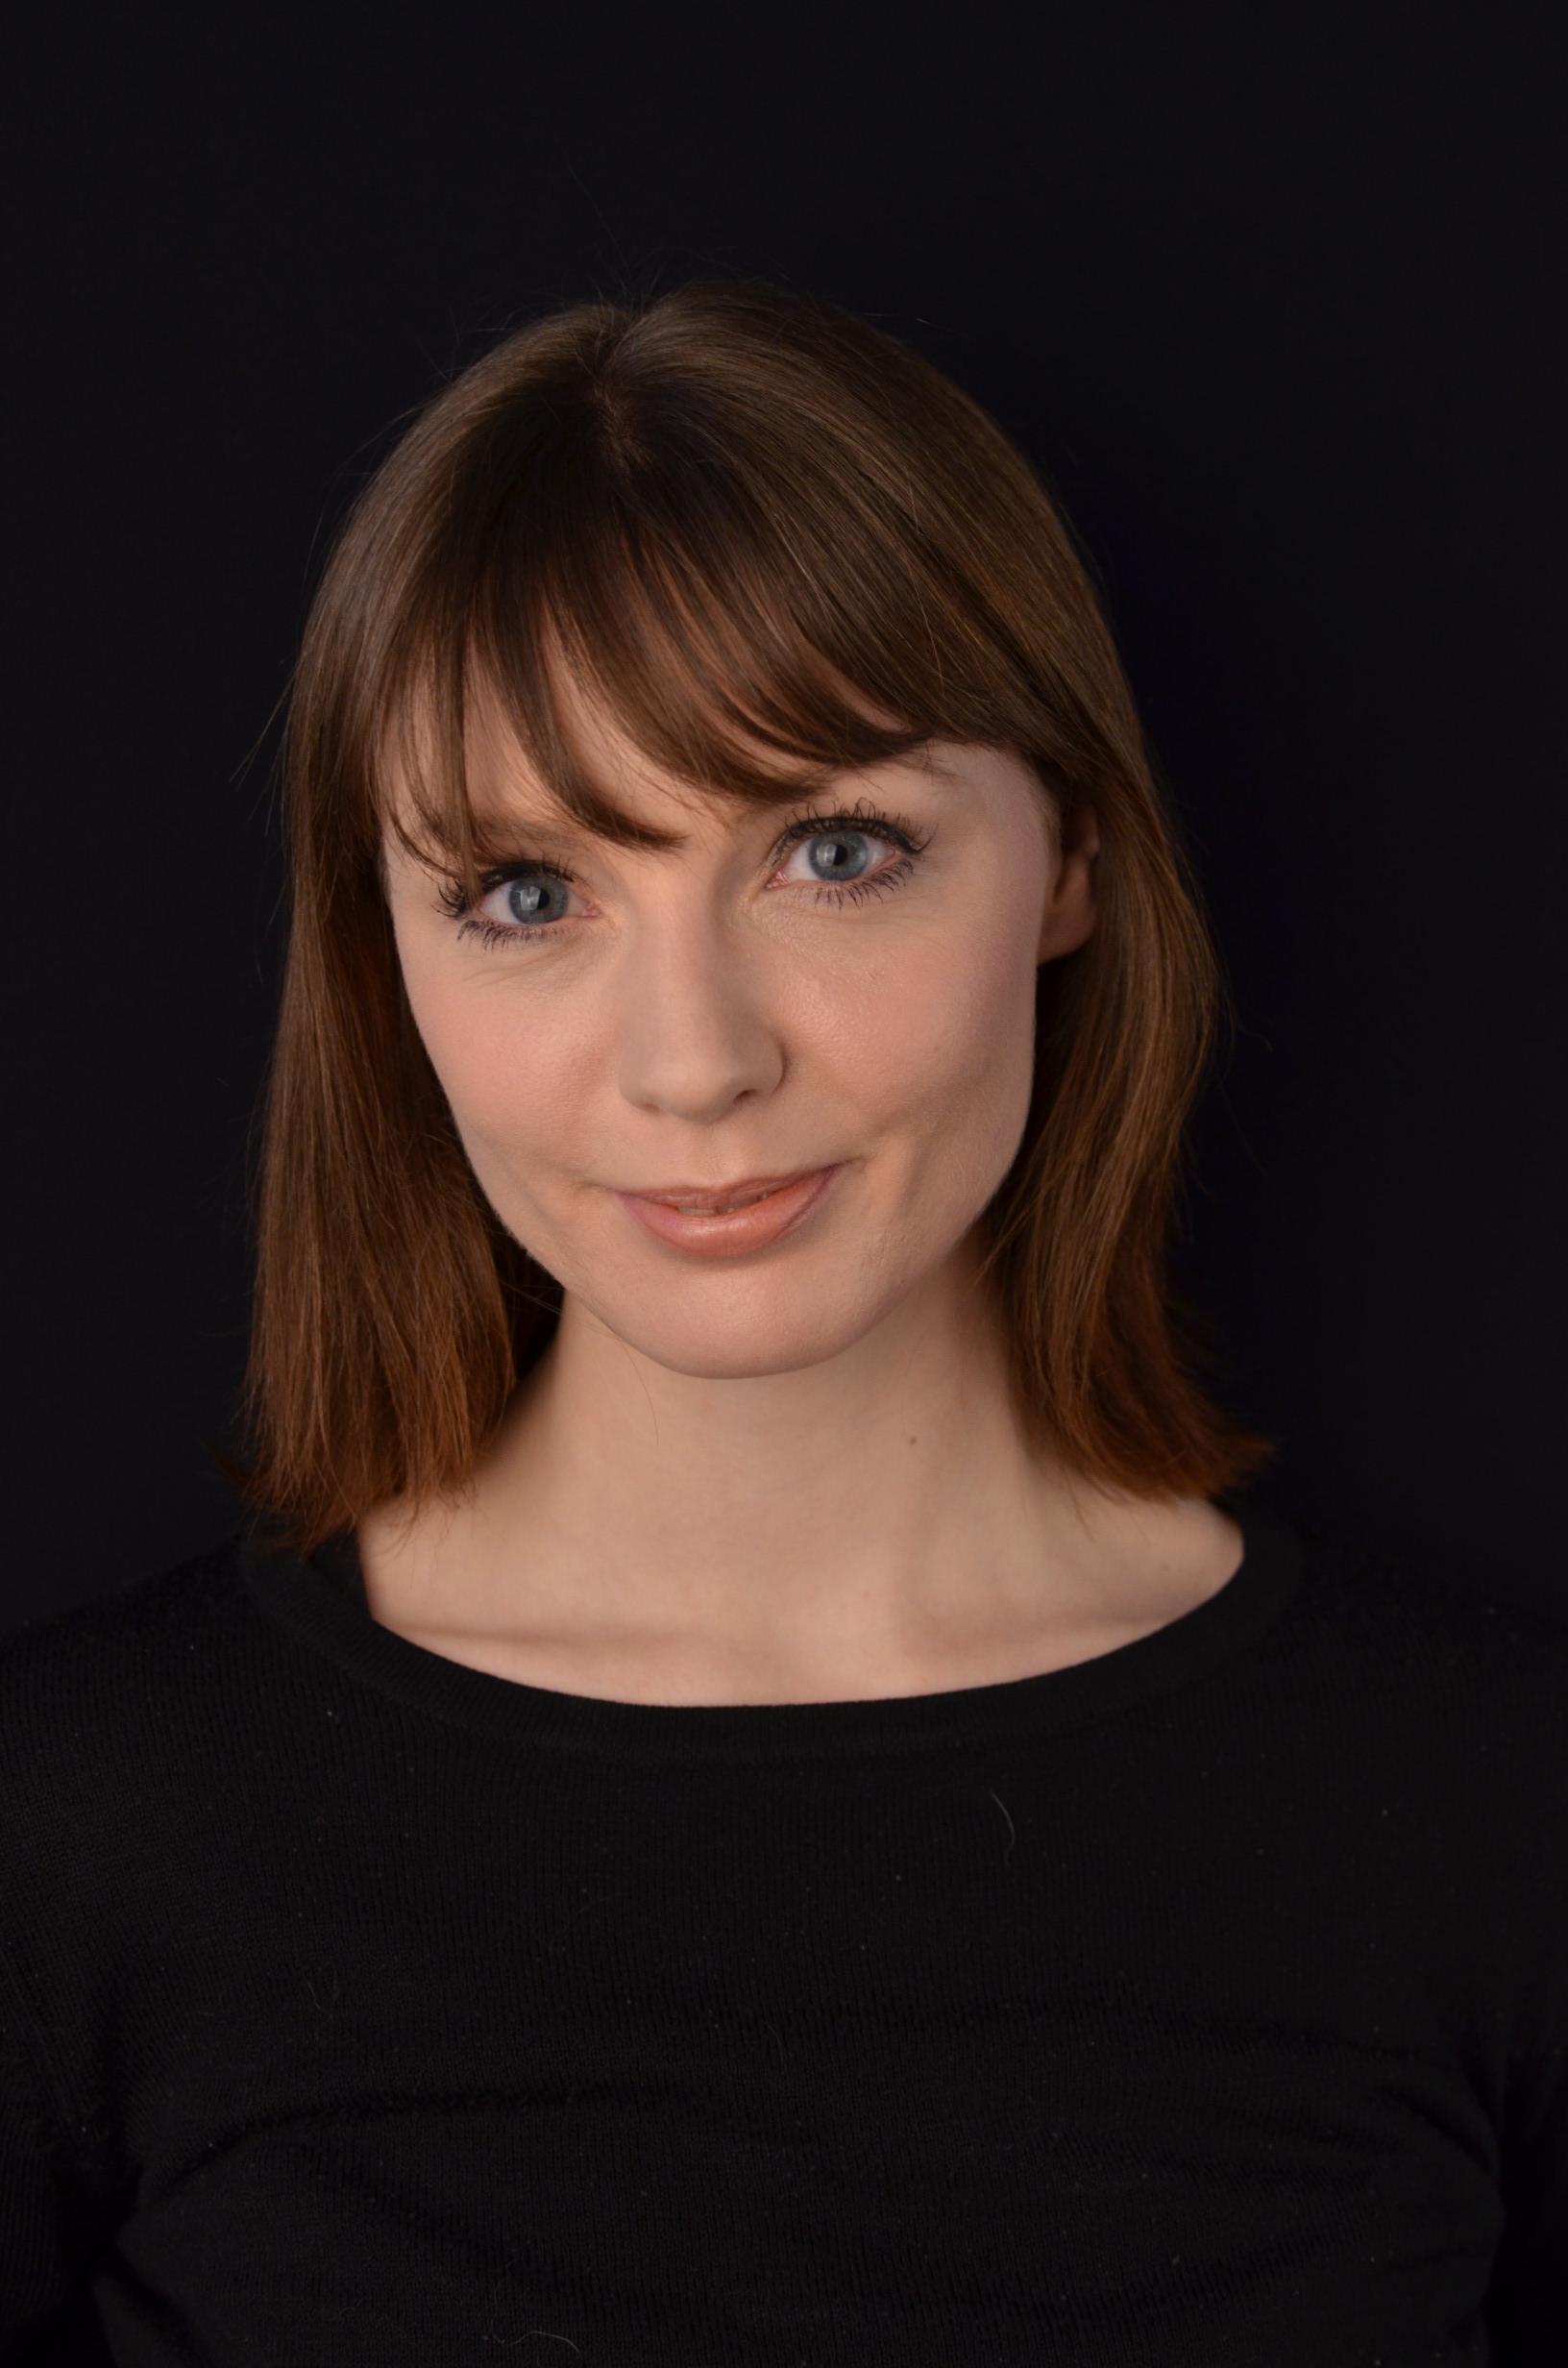 Paula murphy from ireland - 1 3